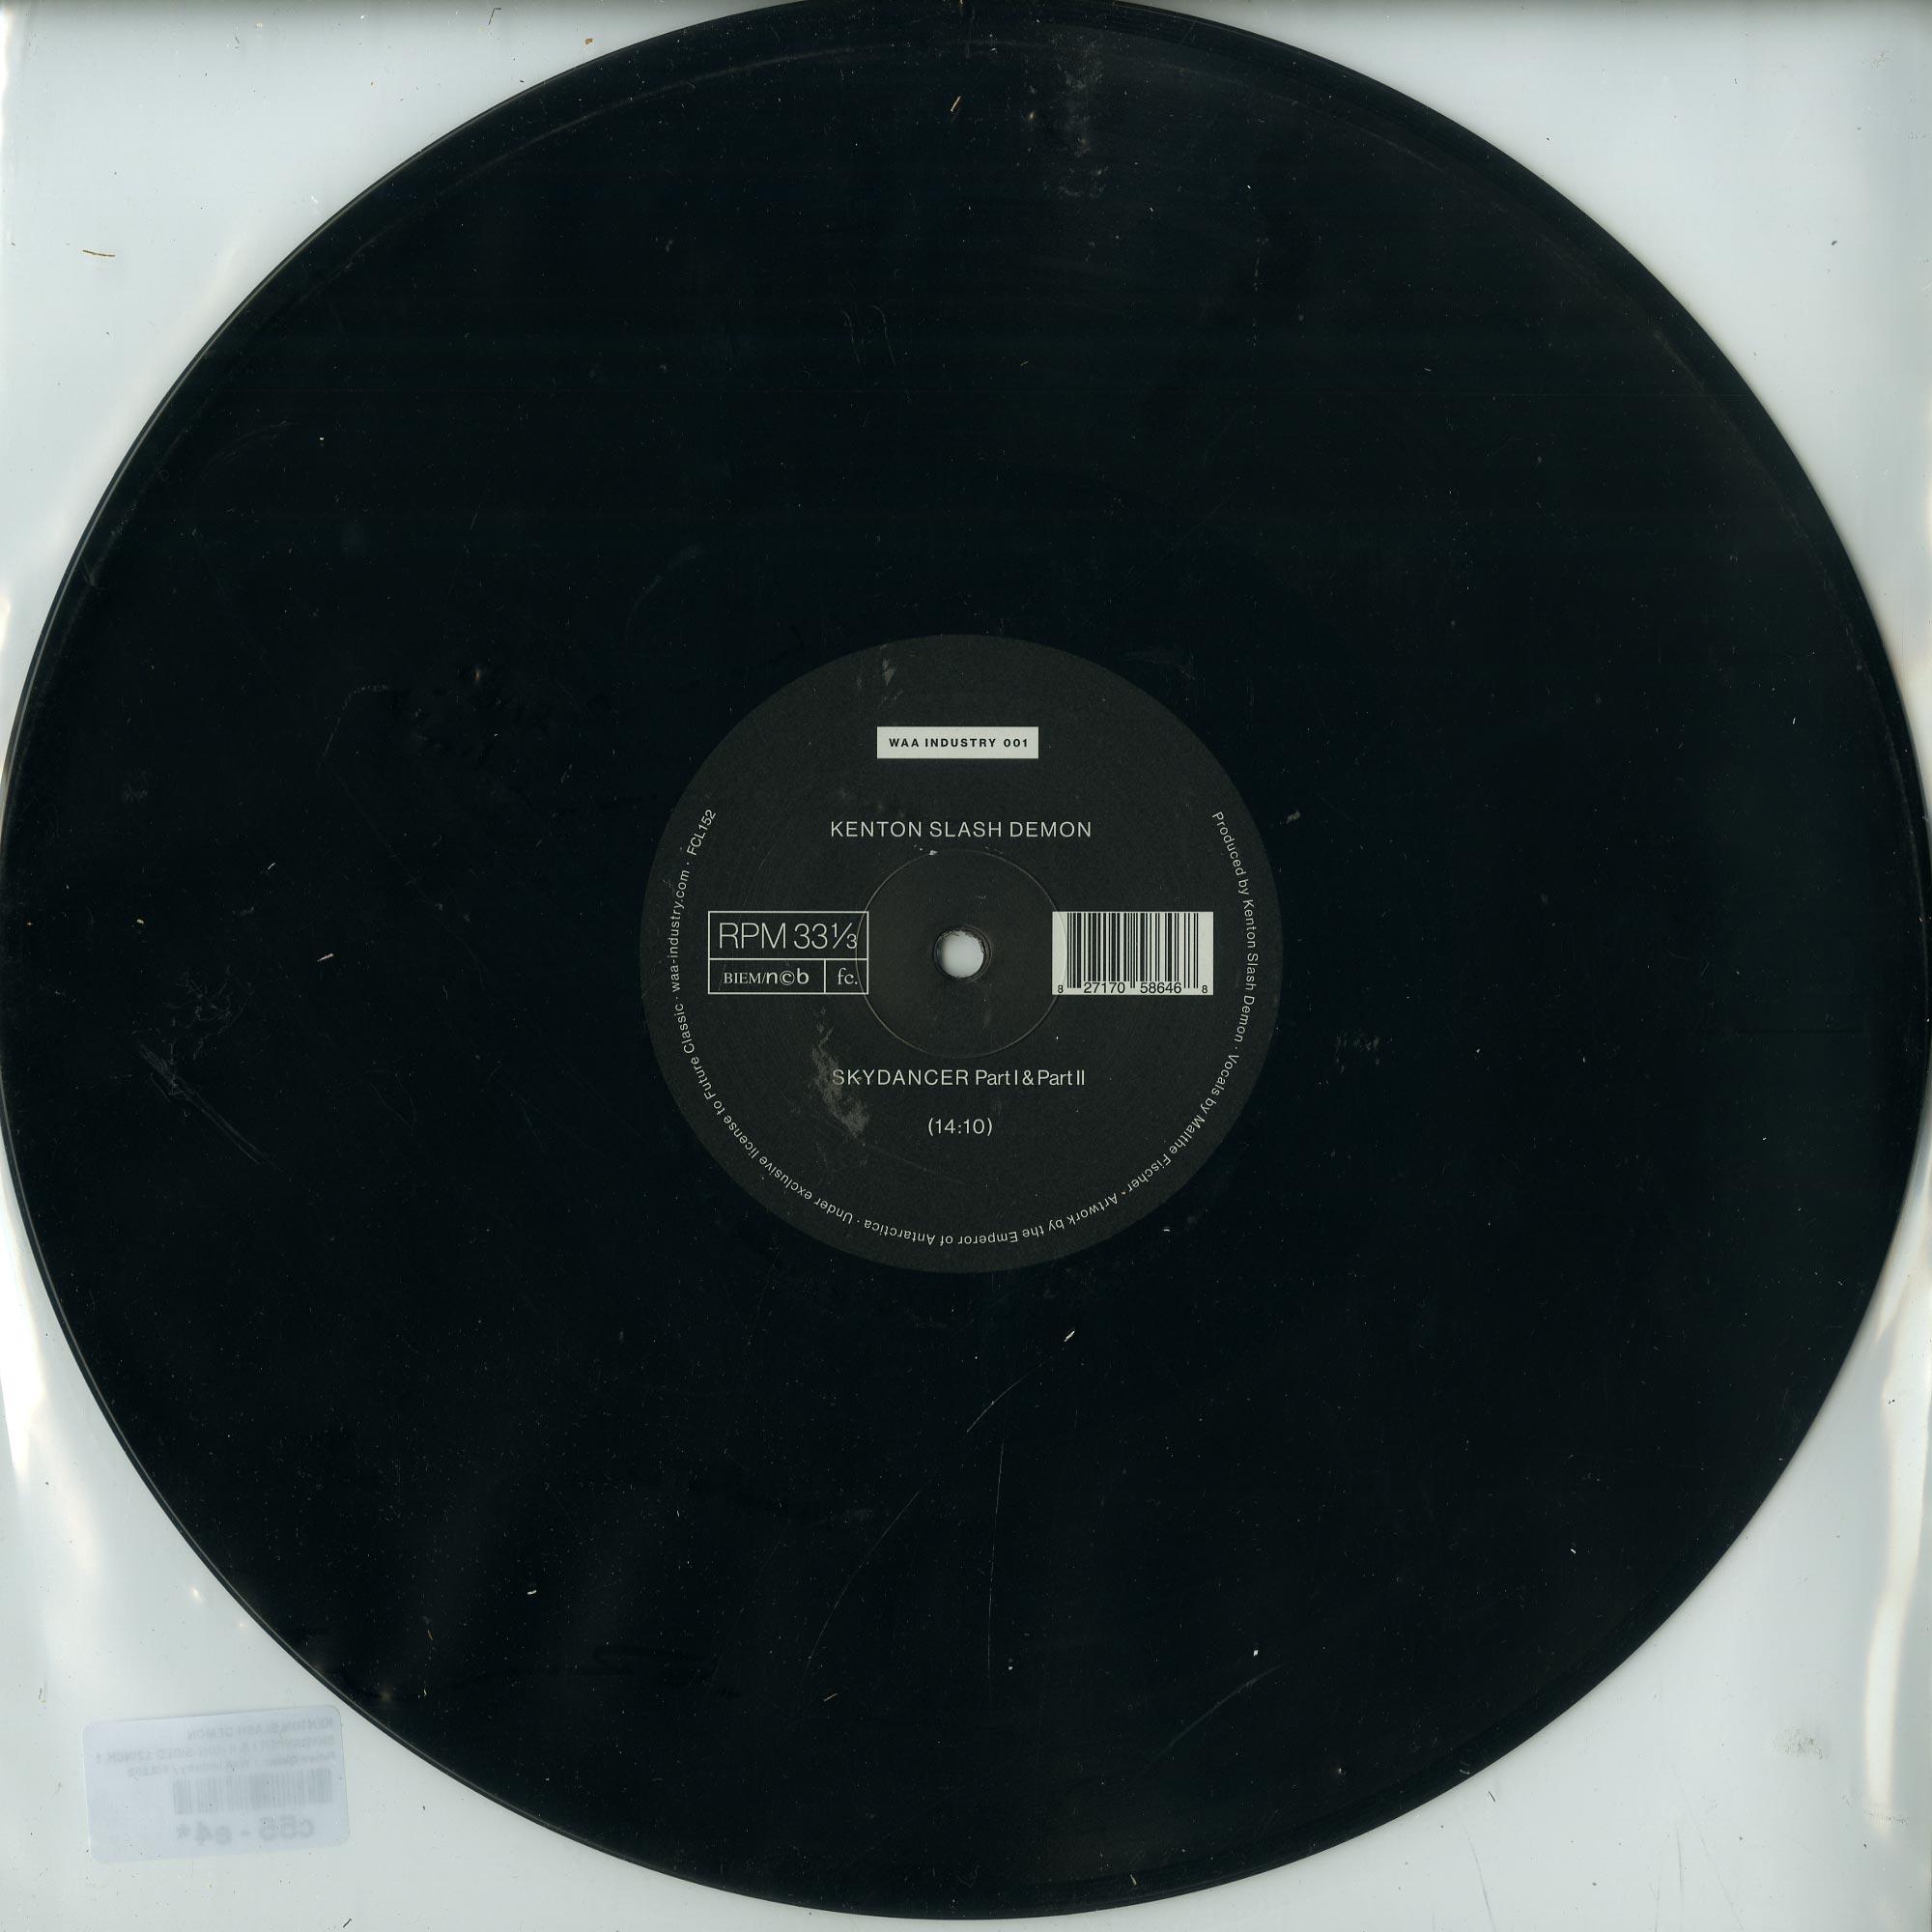 Kenton Slash Demon - SKYDANCER I & II